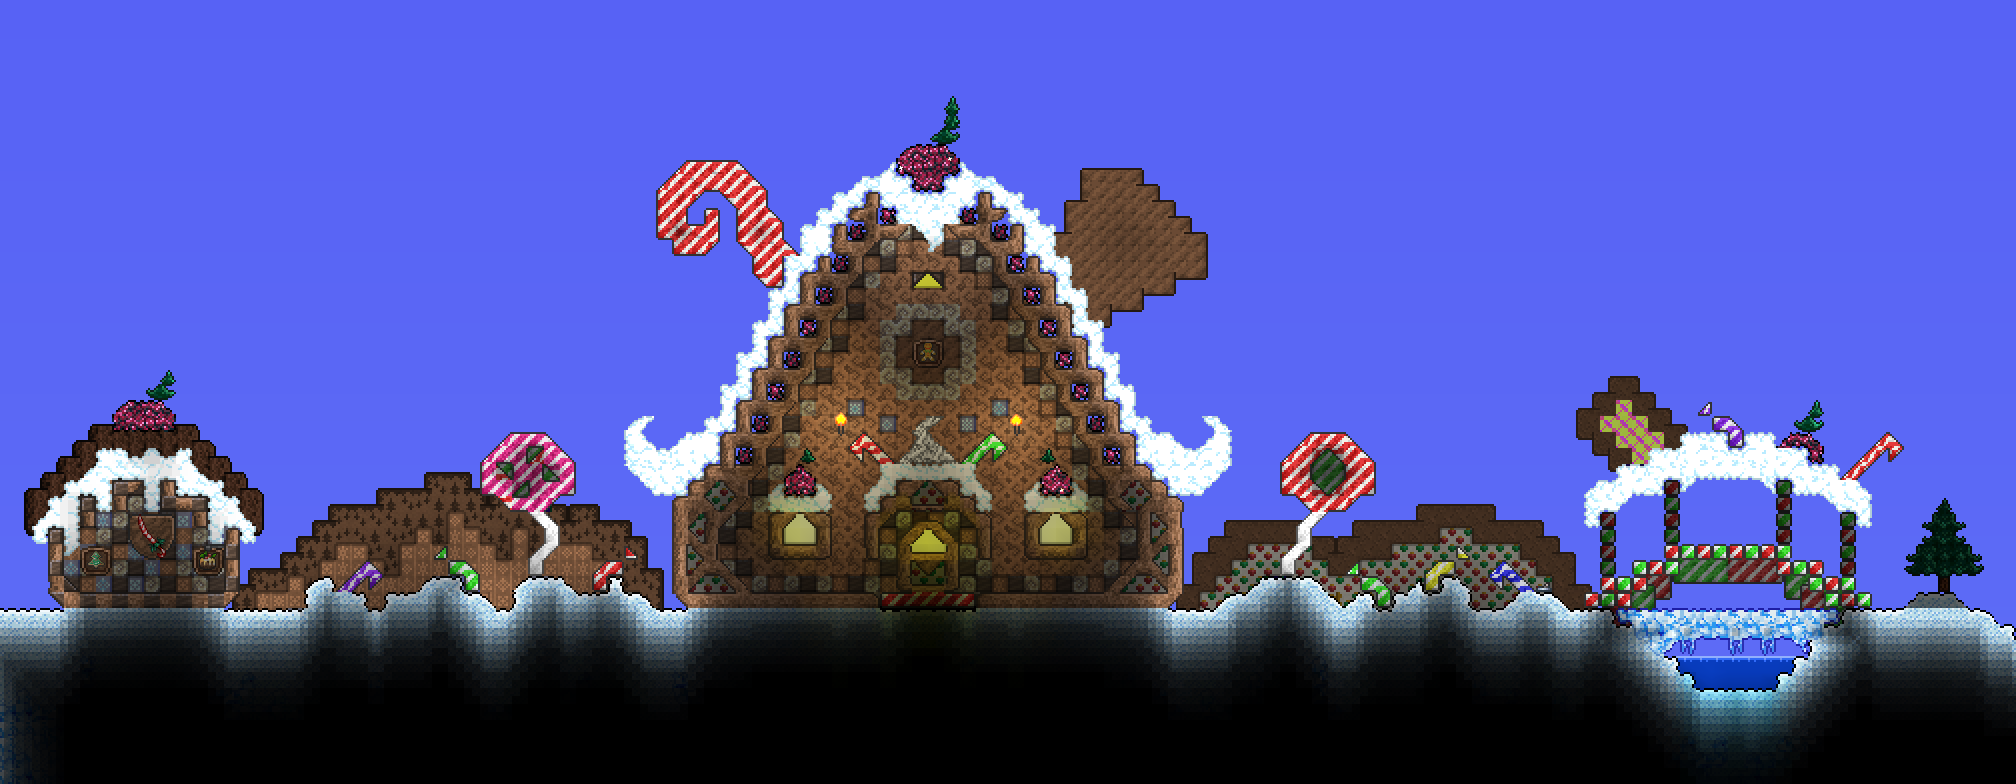 Terraria Christmas House.Pin On Terraria Sigh I Know